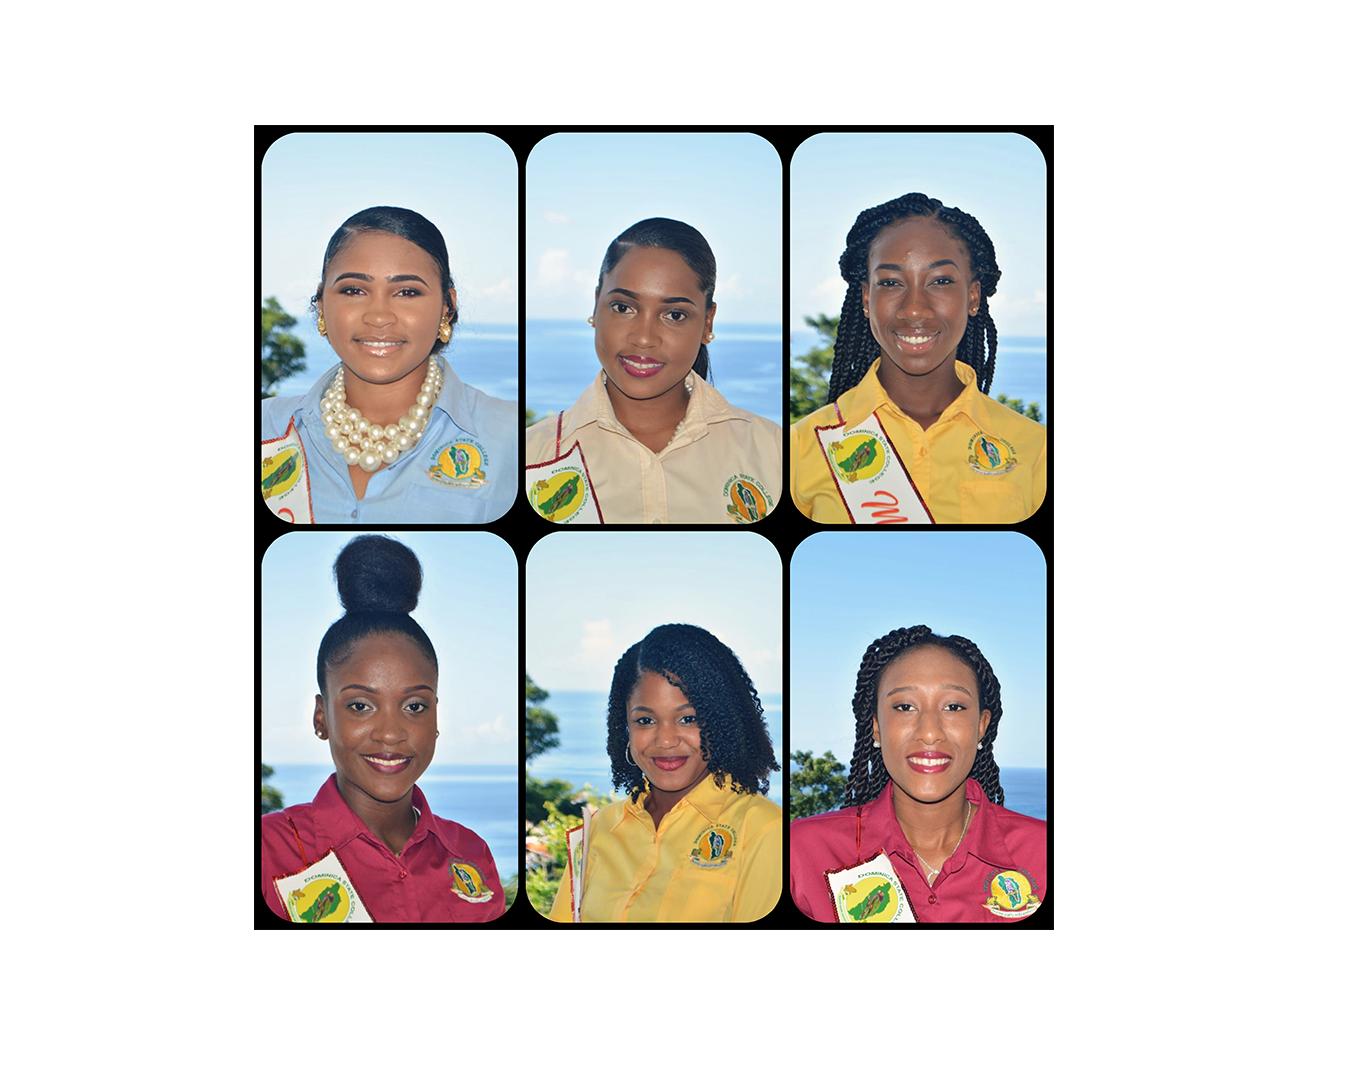 DSC Mas Jamboree 2019 Contestants